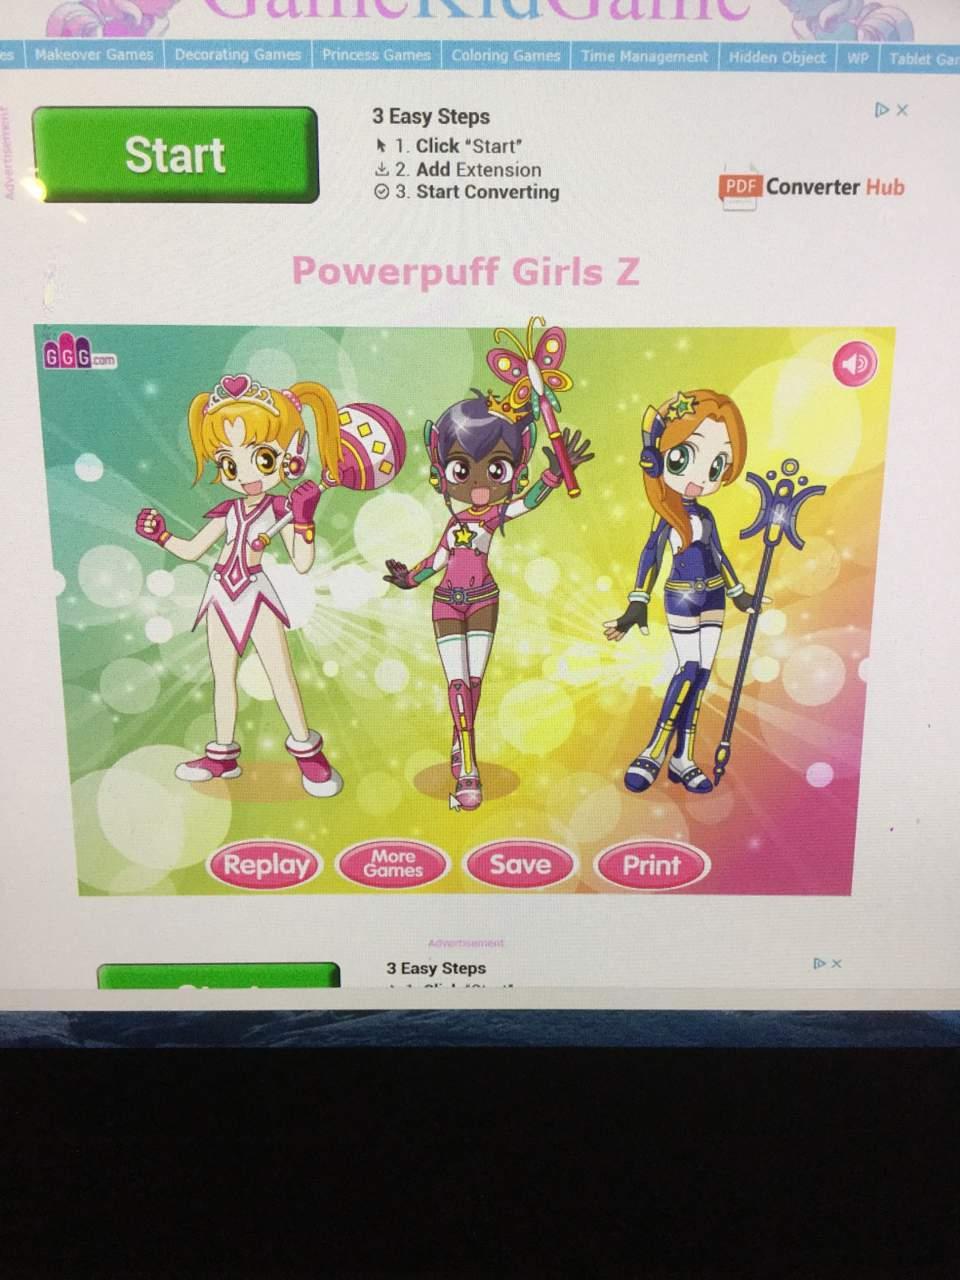 Lincy the Line Girl! | The Powerpuff Girls Amino